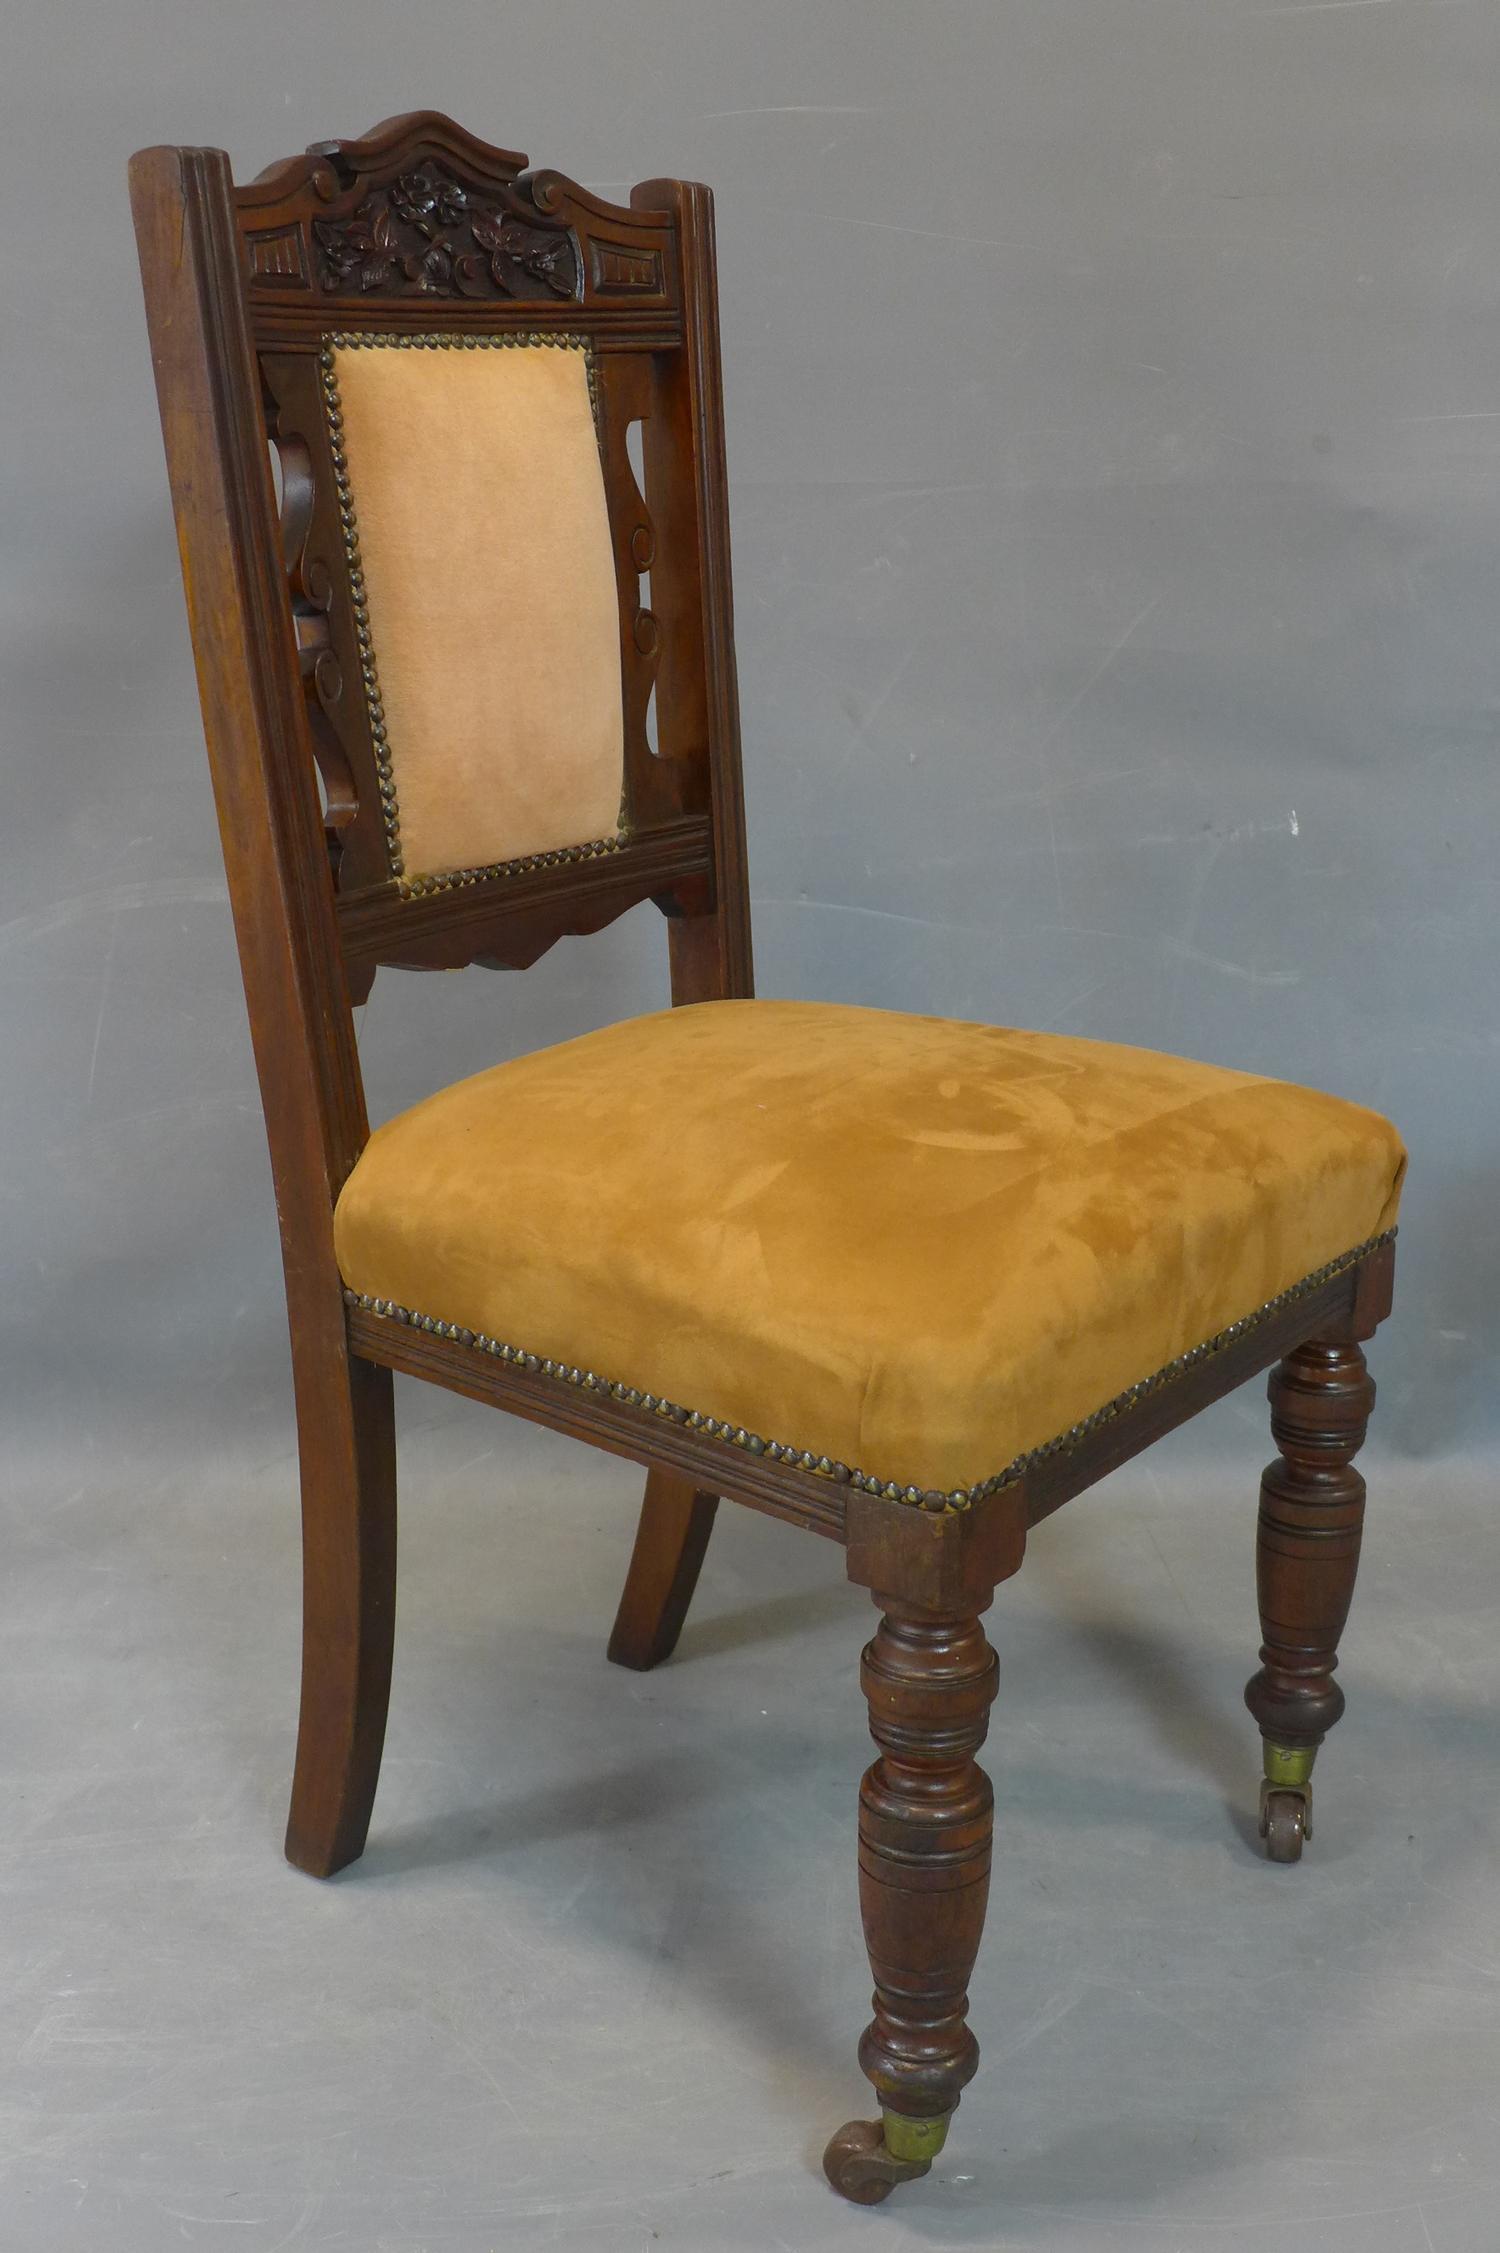 Lot 205 - Caramel coloured Victorian dining chair, together with Blue Victorian walnut dining chair and an